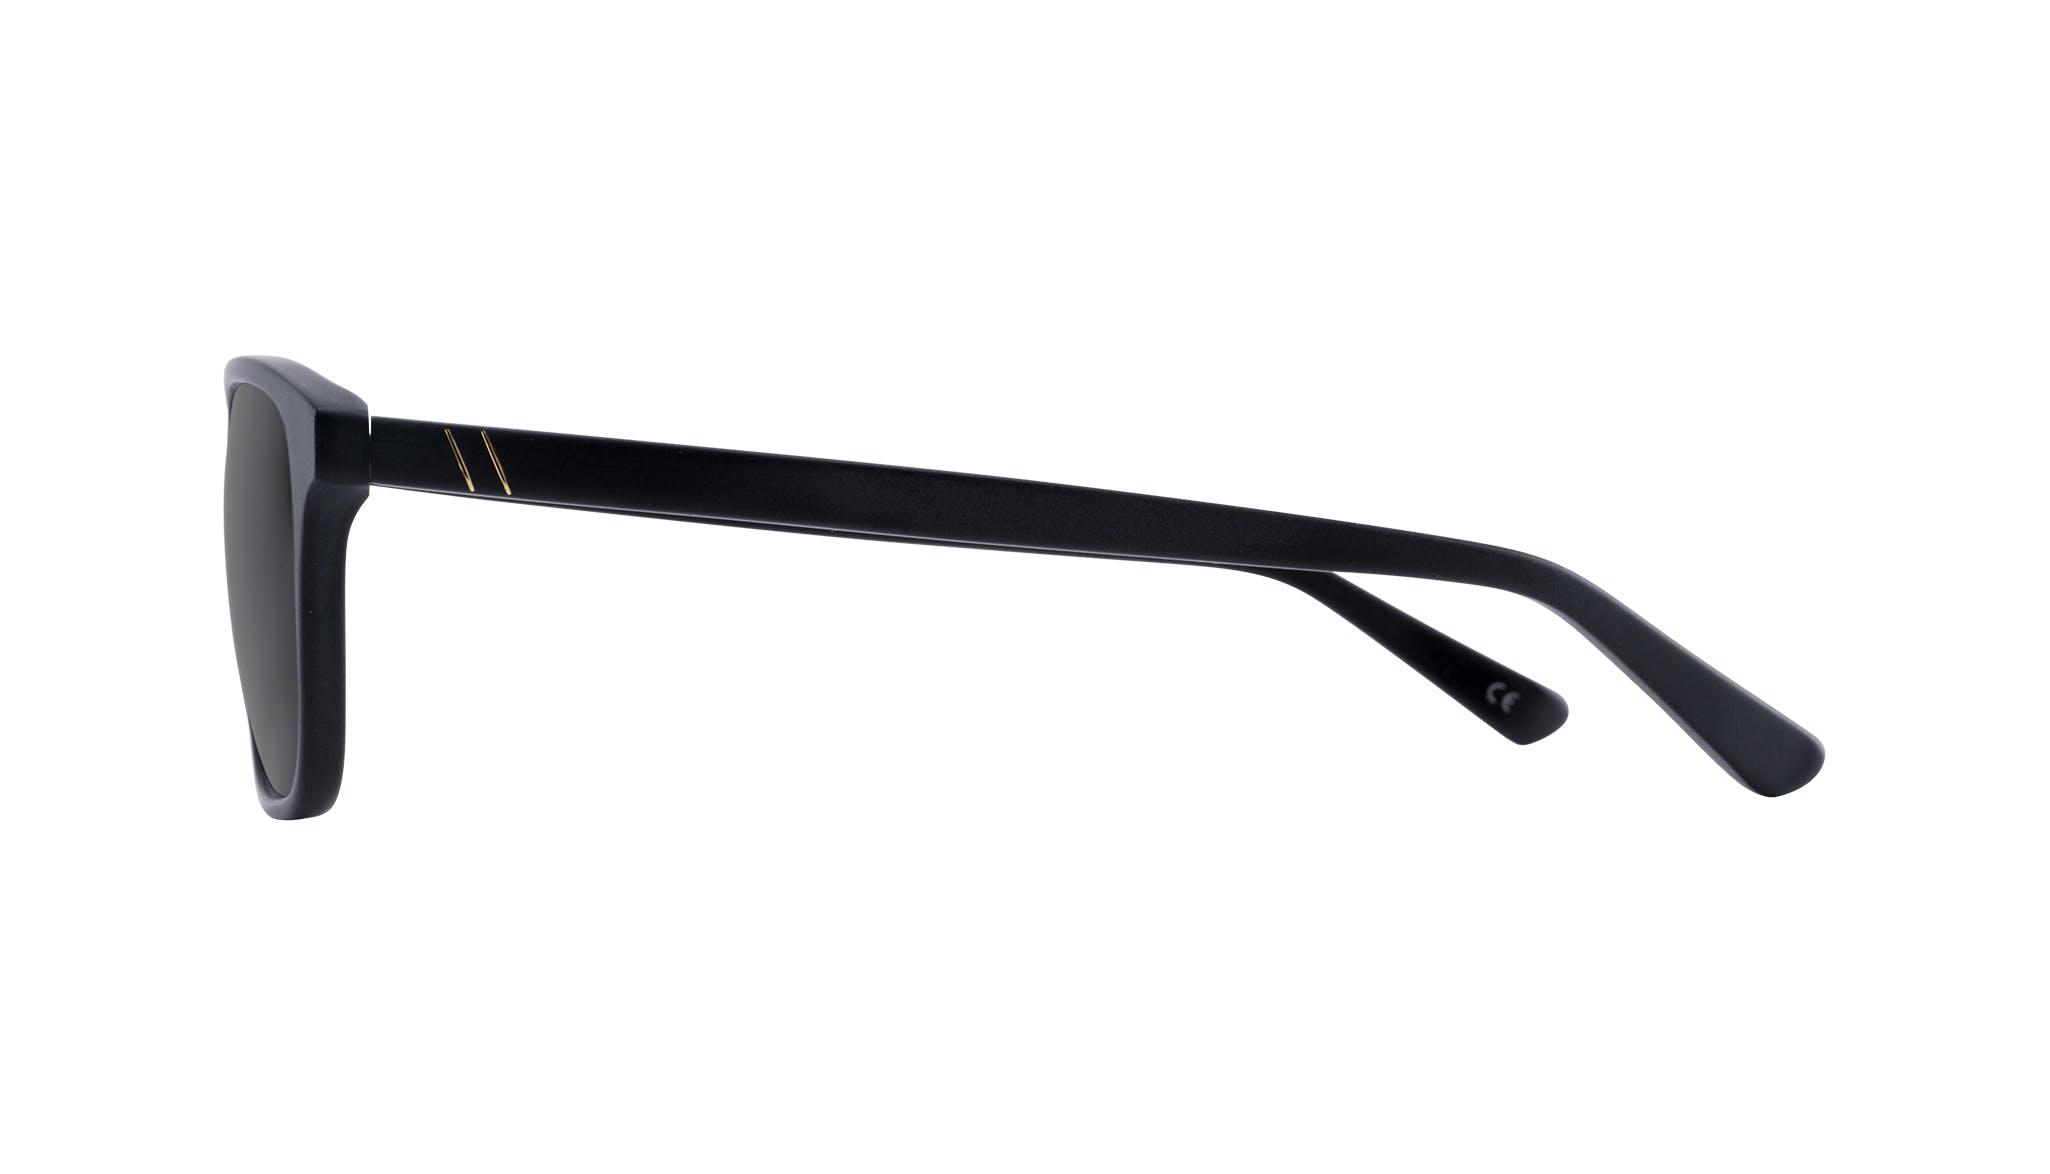 Affordable Fashion Glasses Rectangle Sunglasses Men Dare Matte Black Side